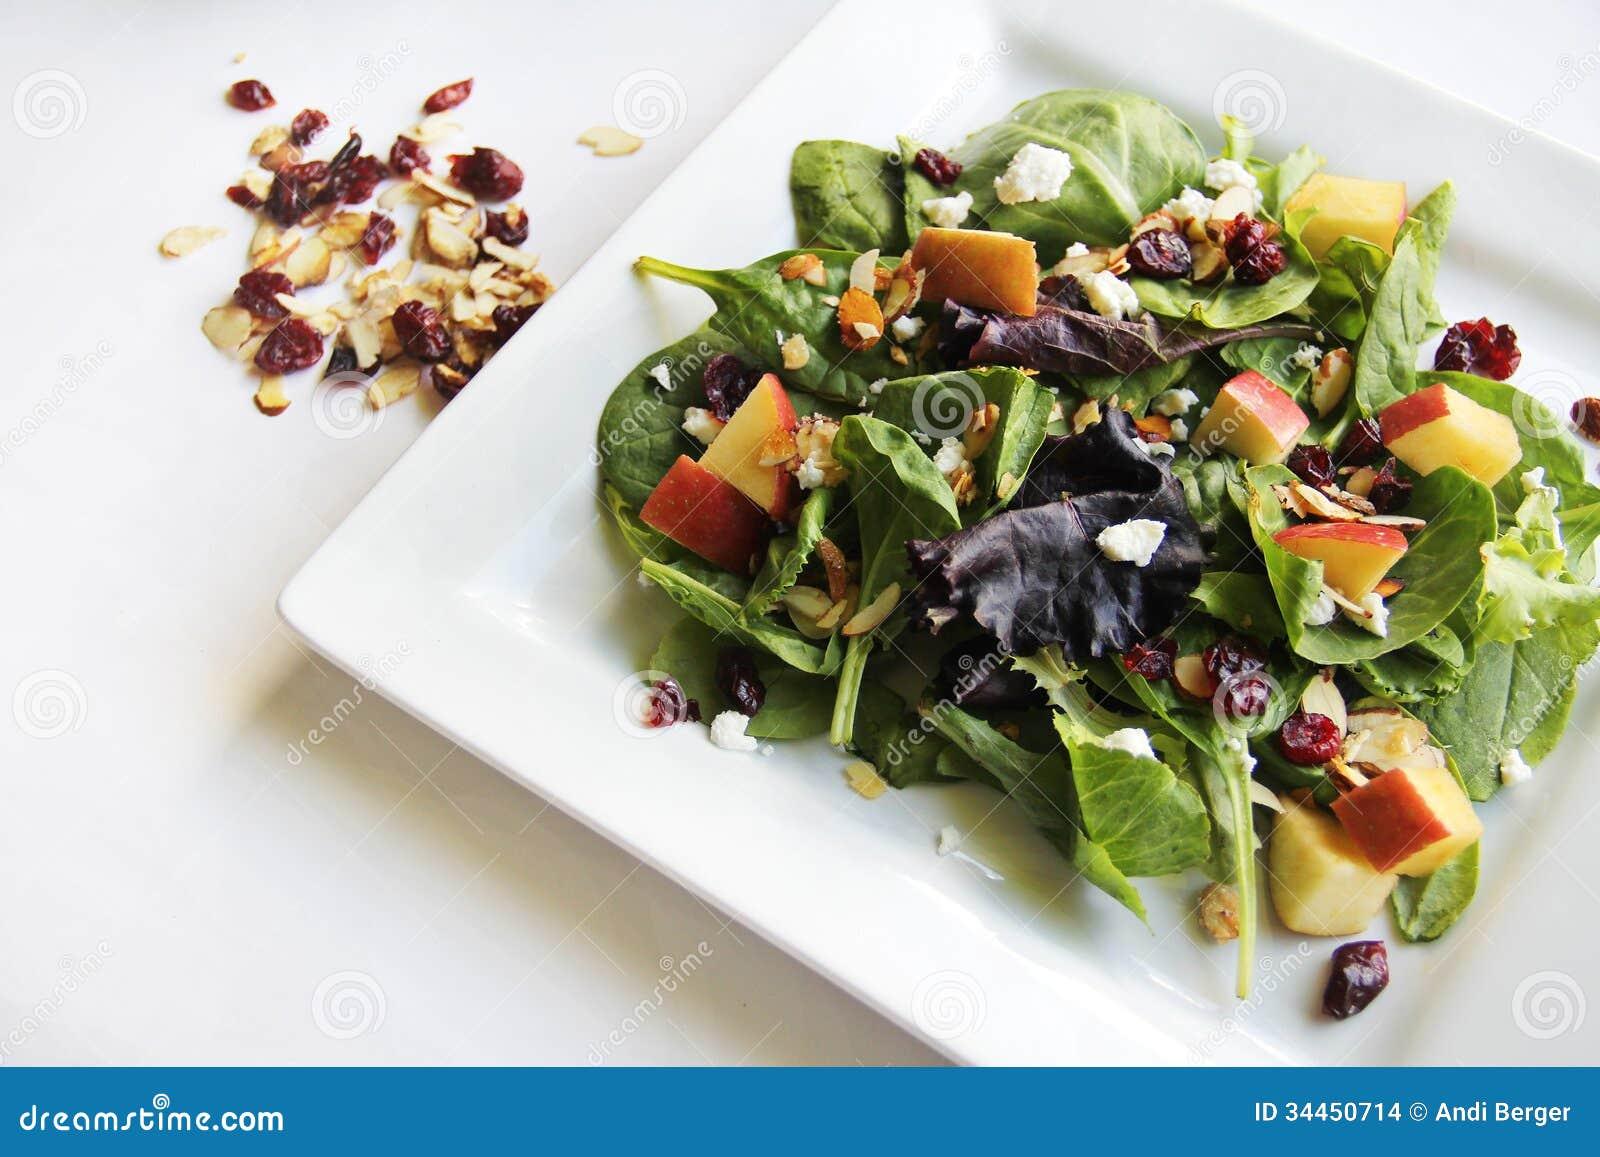 Organic baby spring mix salad